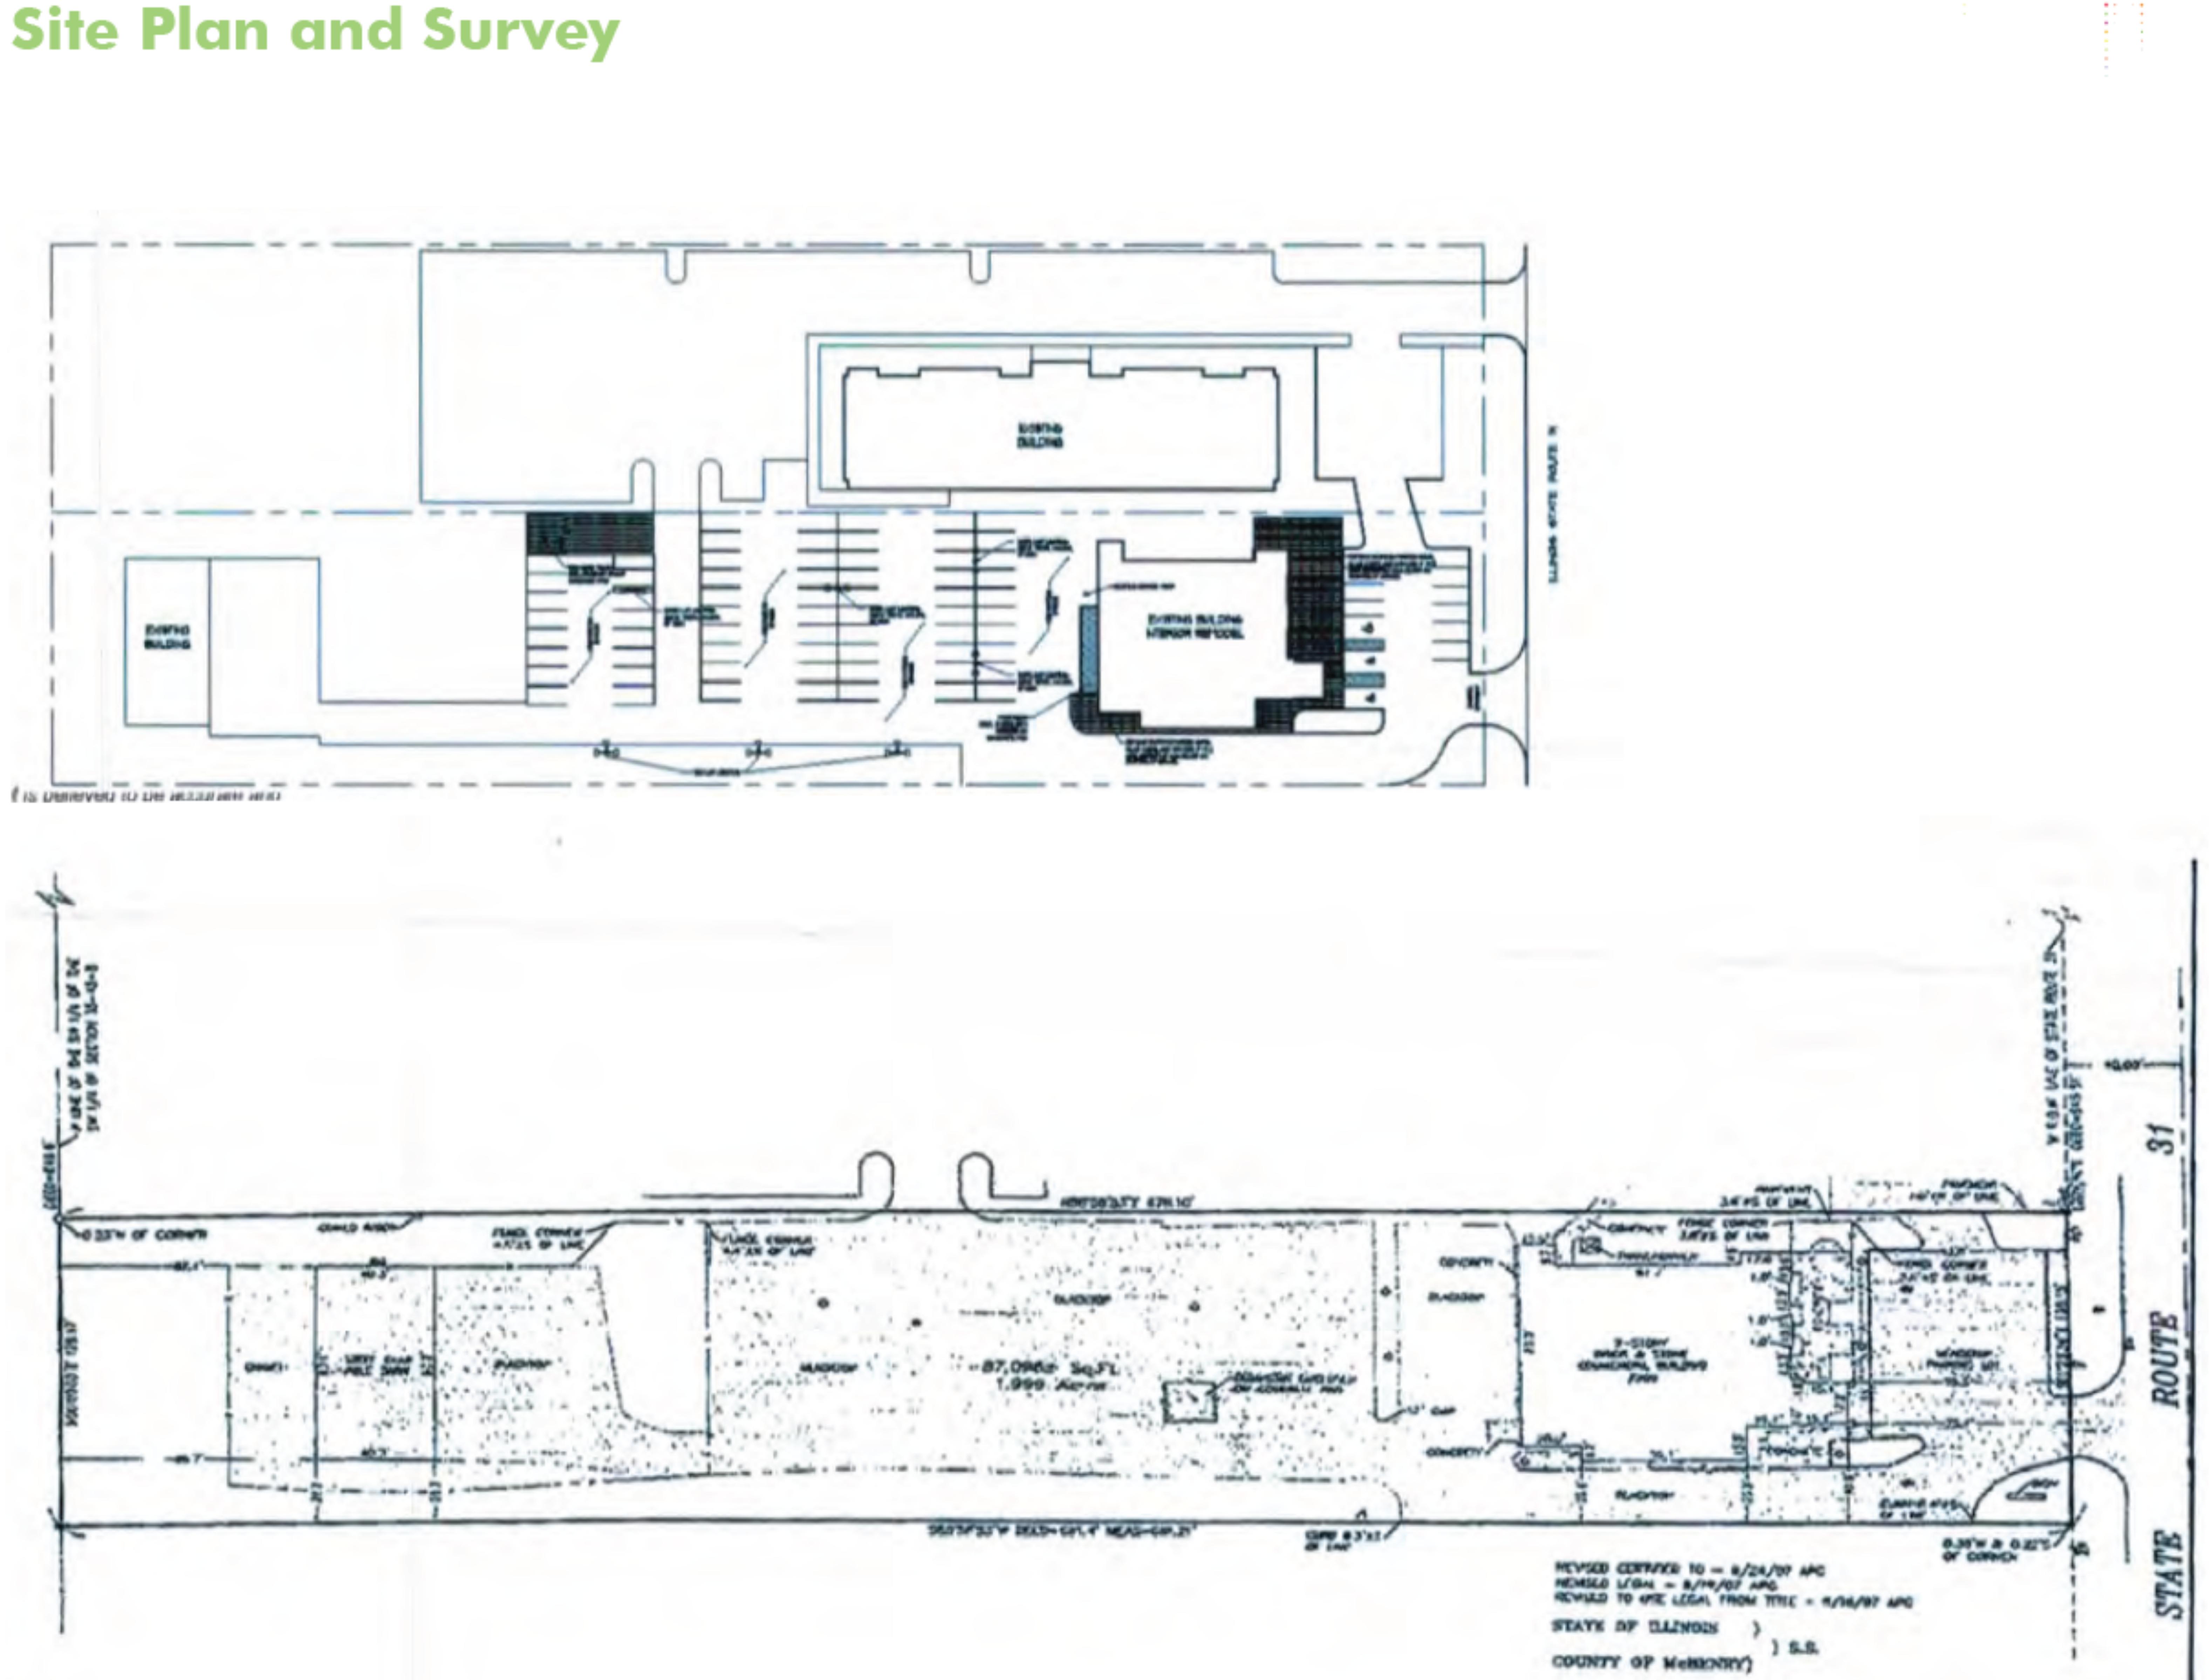 Former Restaurant Available: site plan